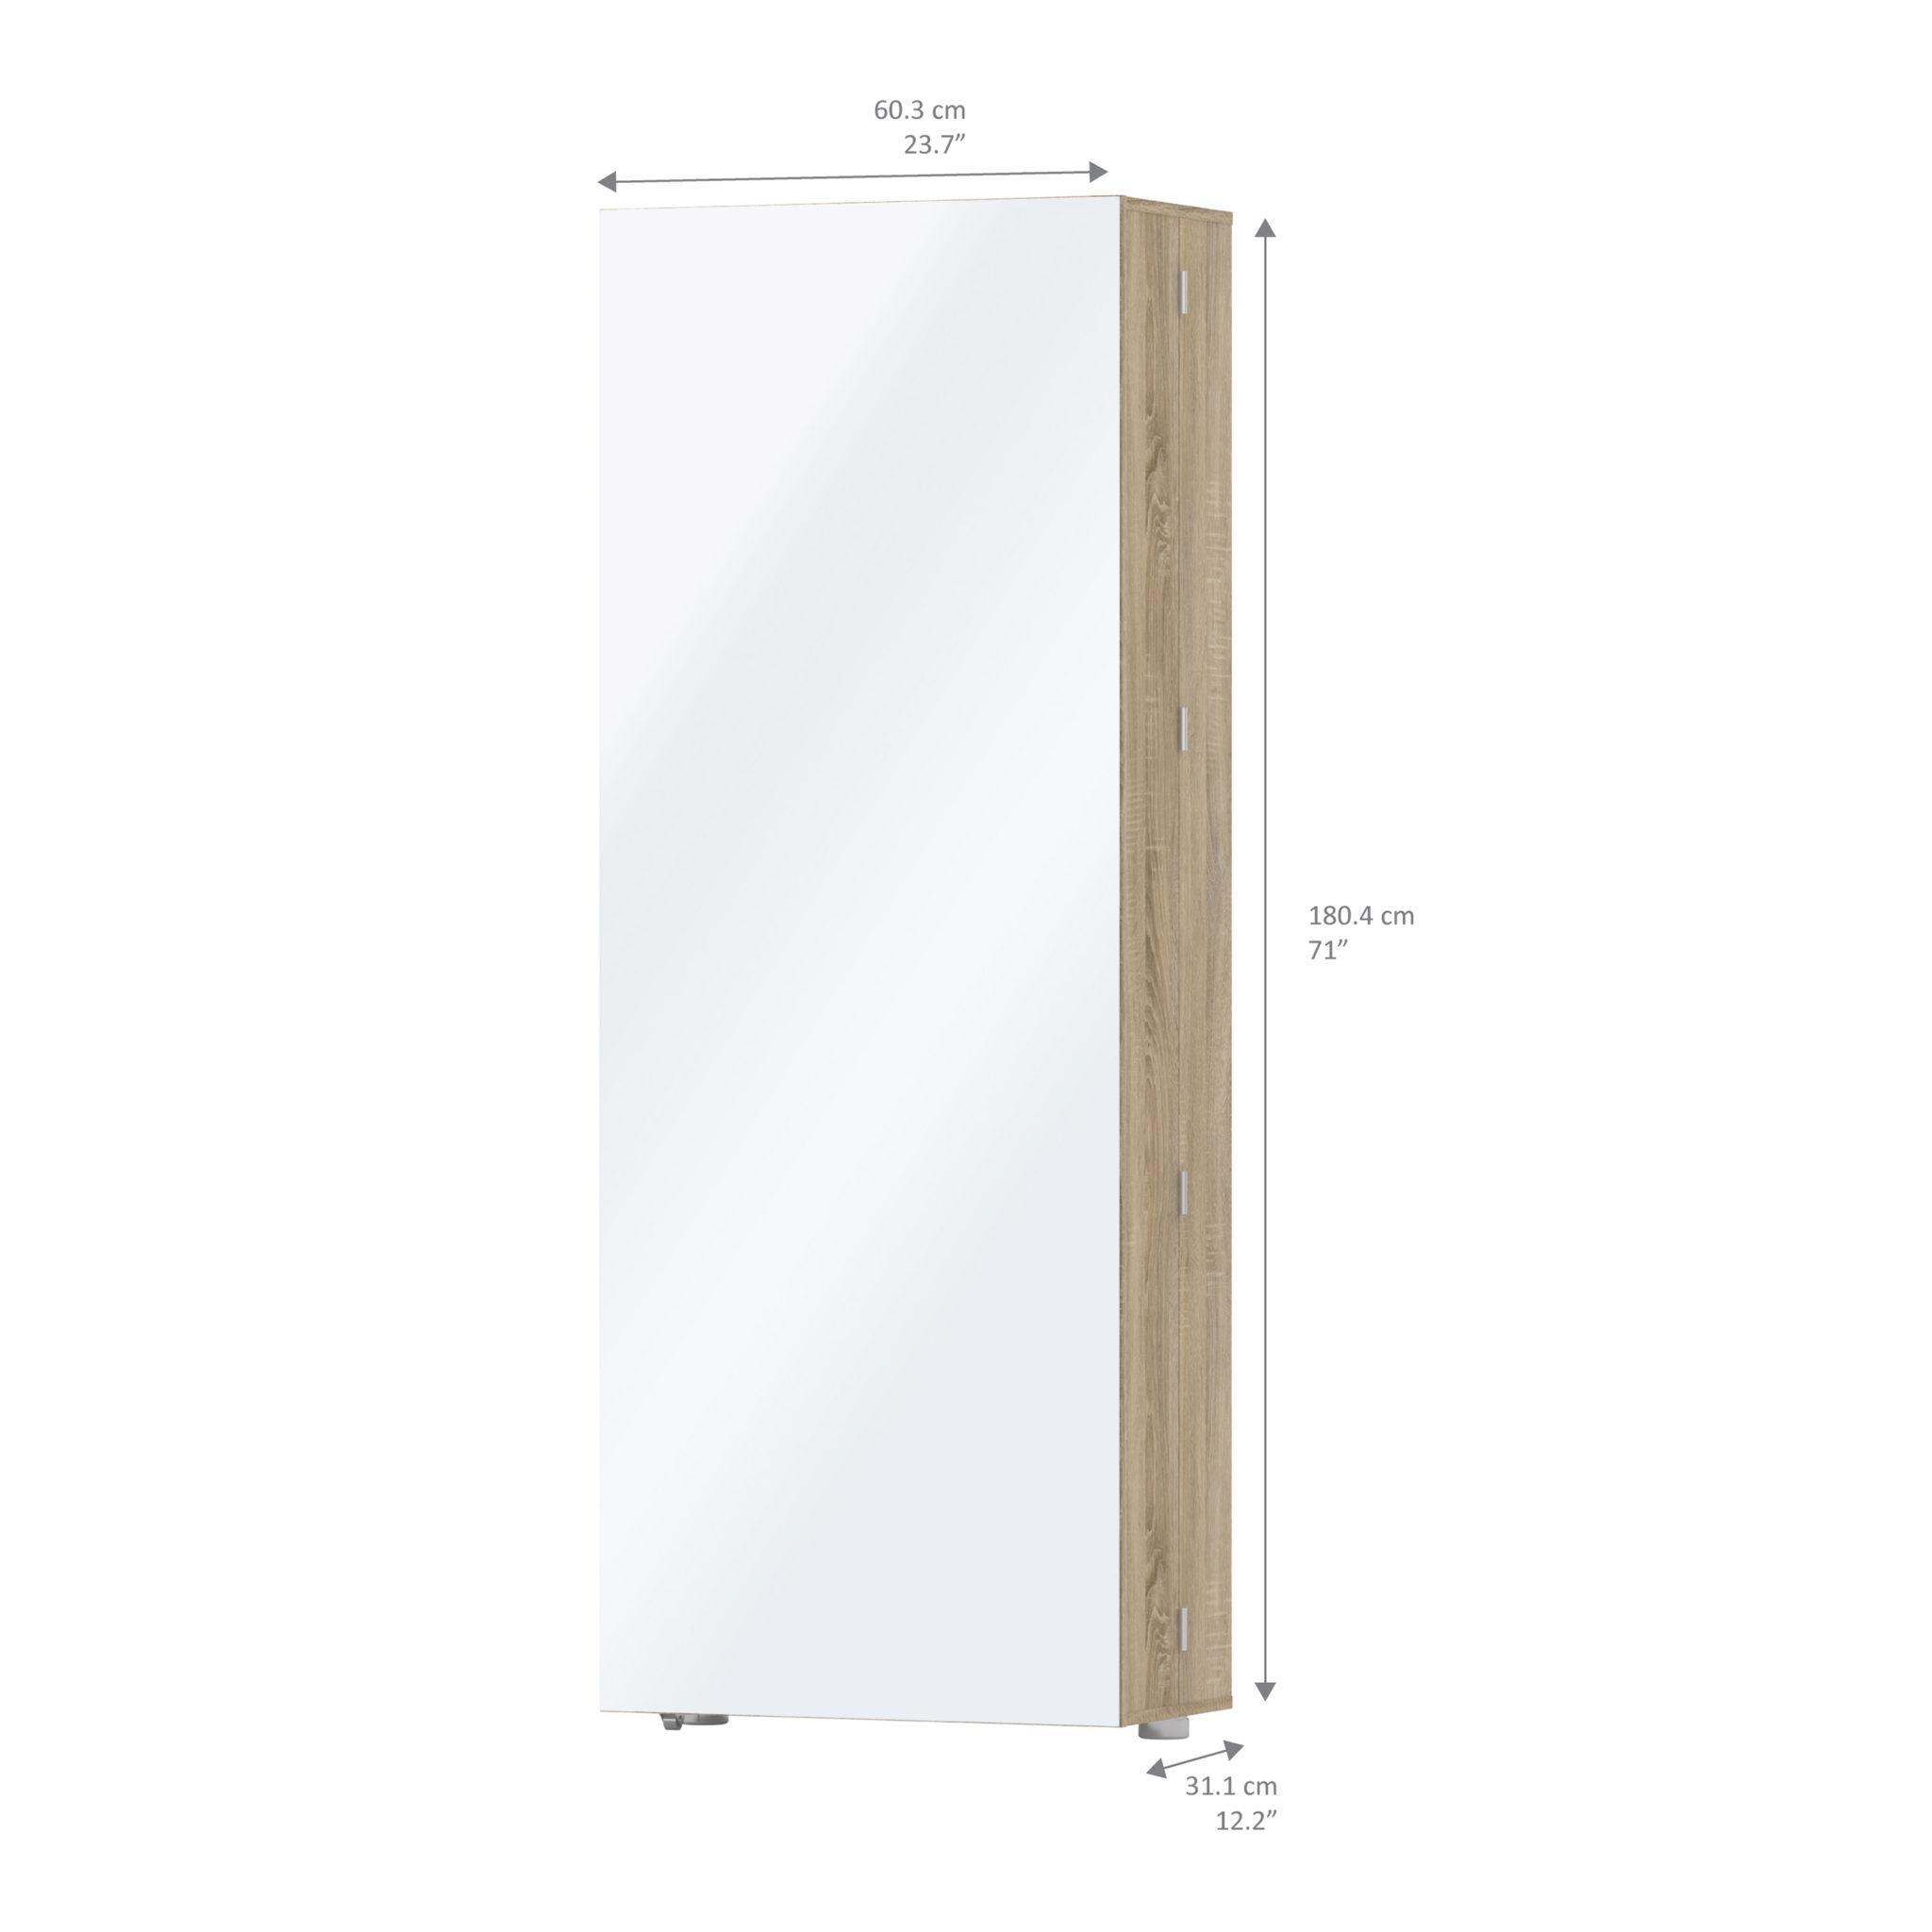 Mighto Shoe Cabinet 1 Door w/ Mirror in Oak